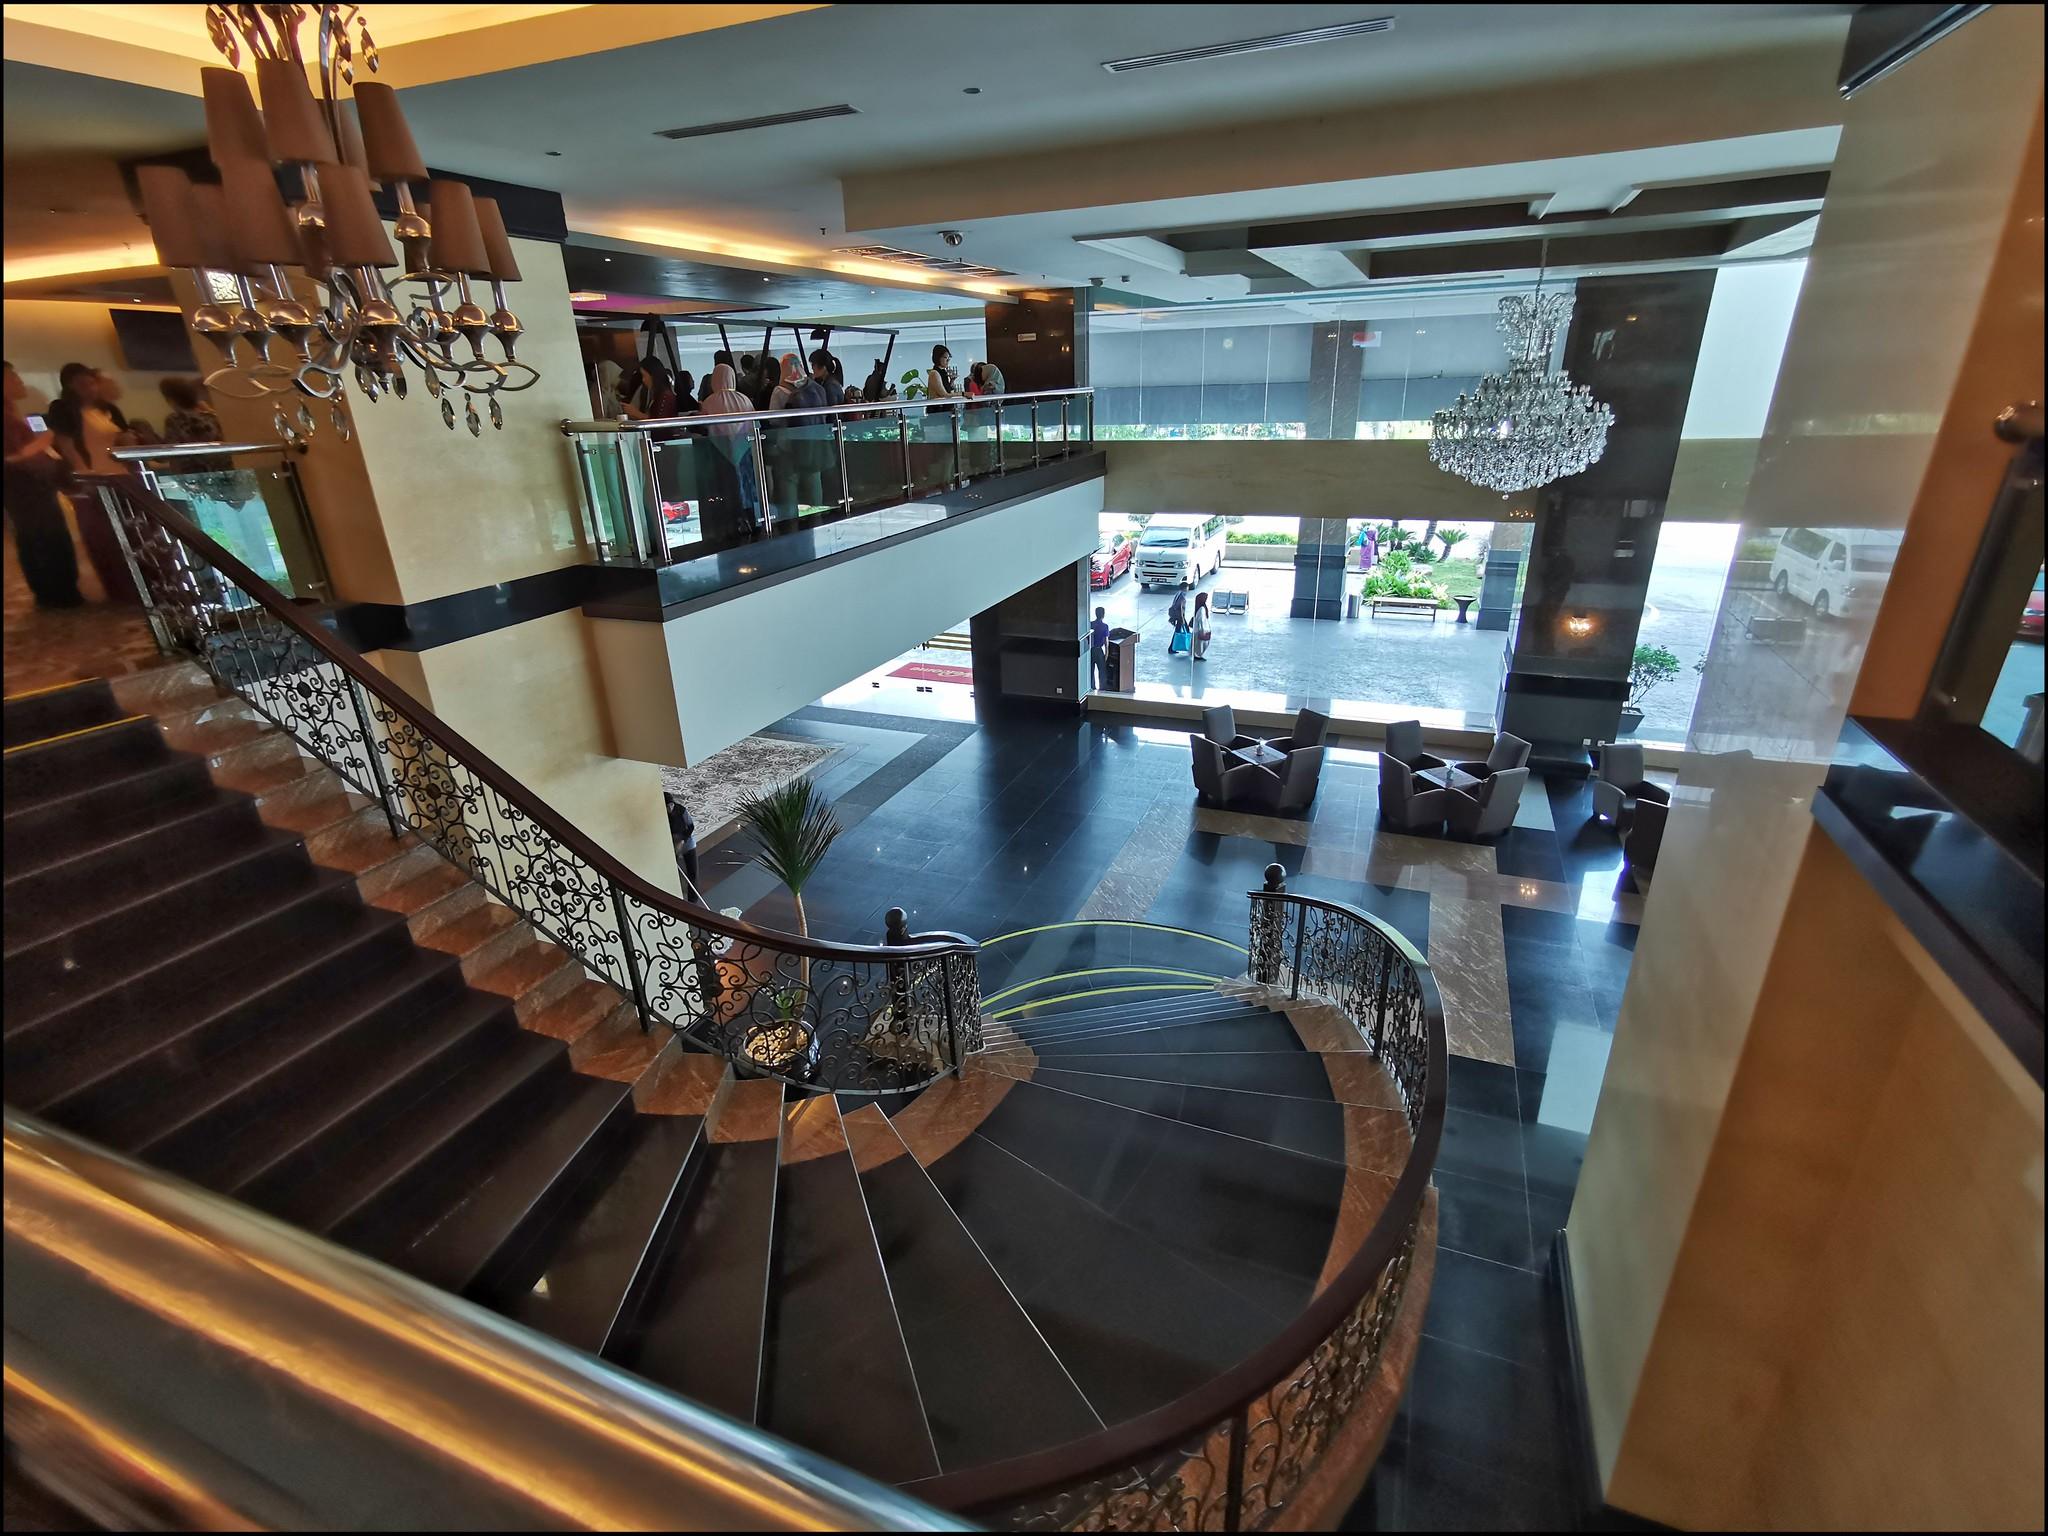 The main lobby of the hotel